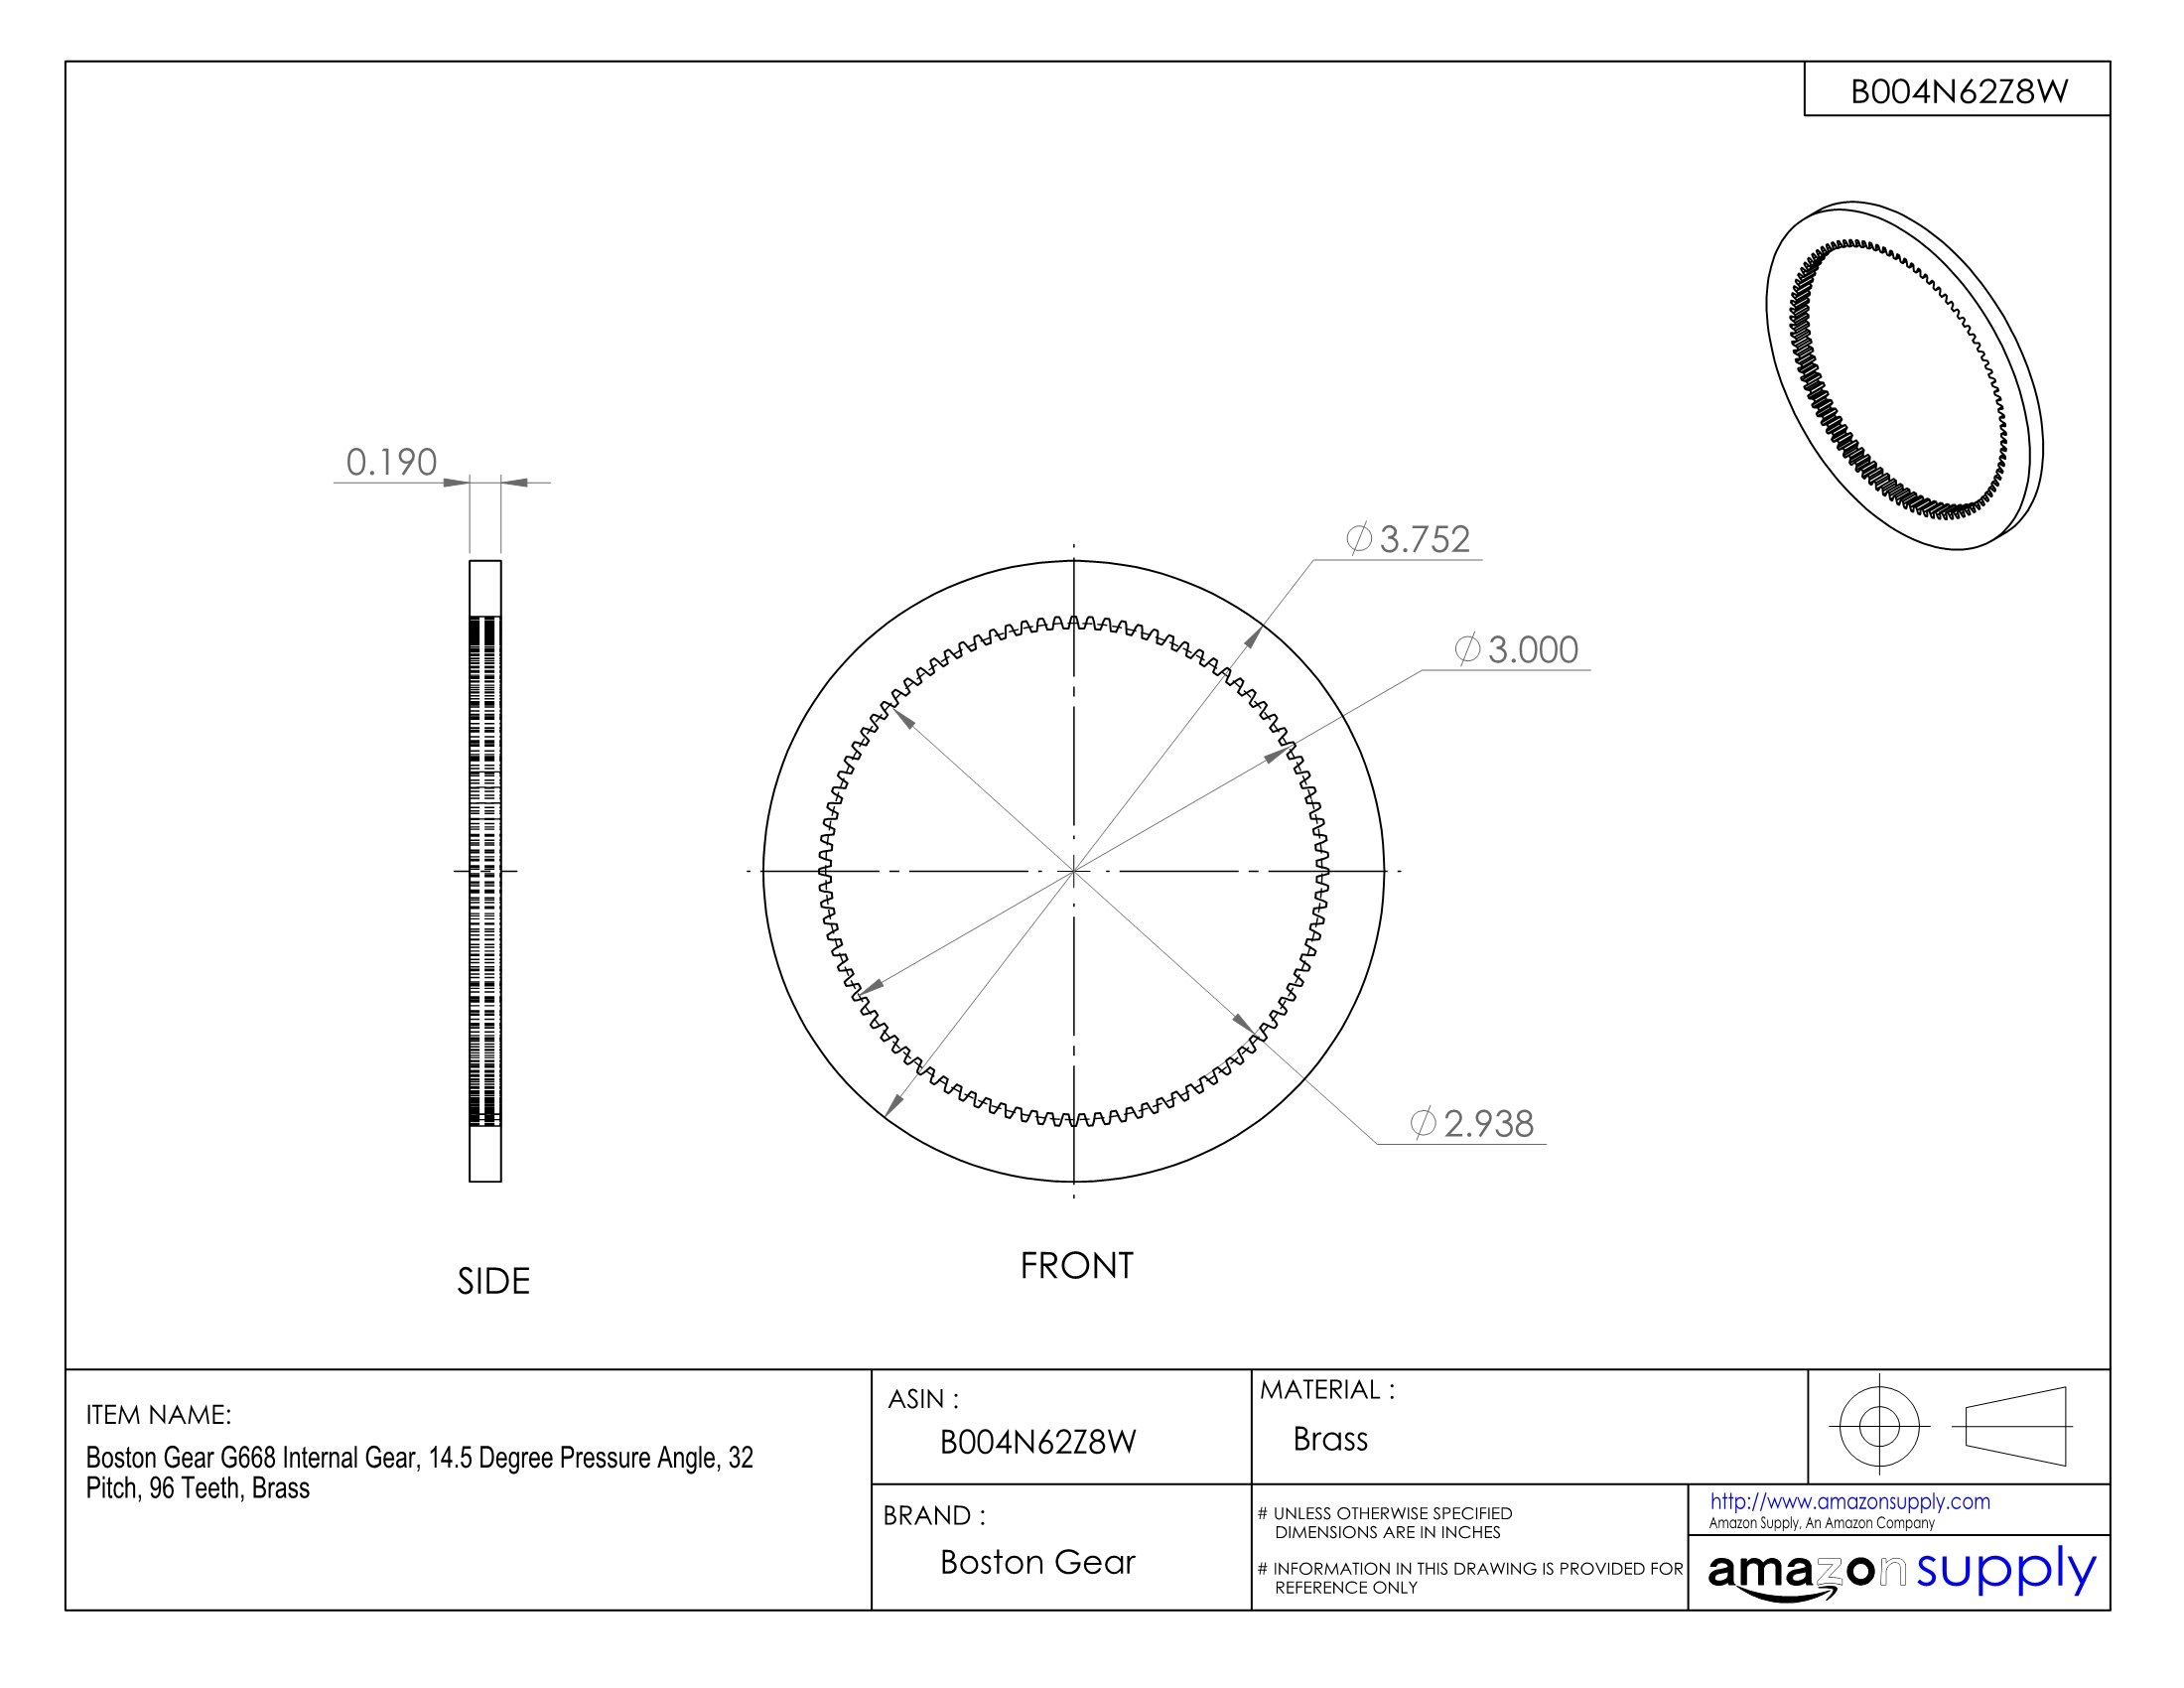 Boston Gear G668 Internal Gear, 14.5 Degree Pressure Angle, 32 Pitch, 96 Teeth, Brass by Boston Gear